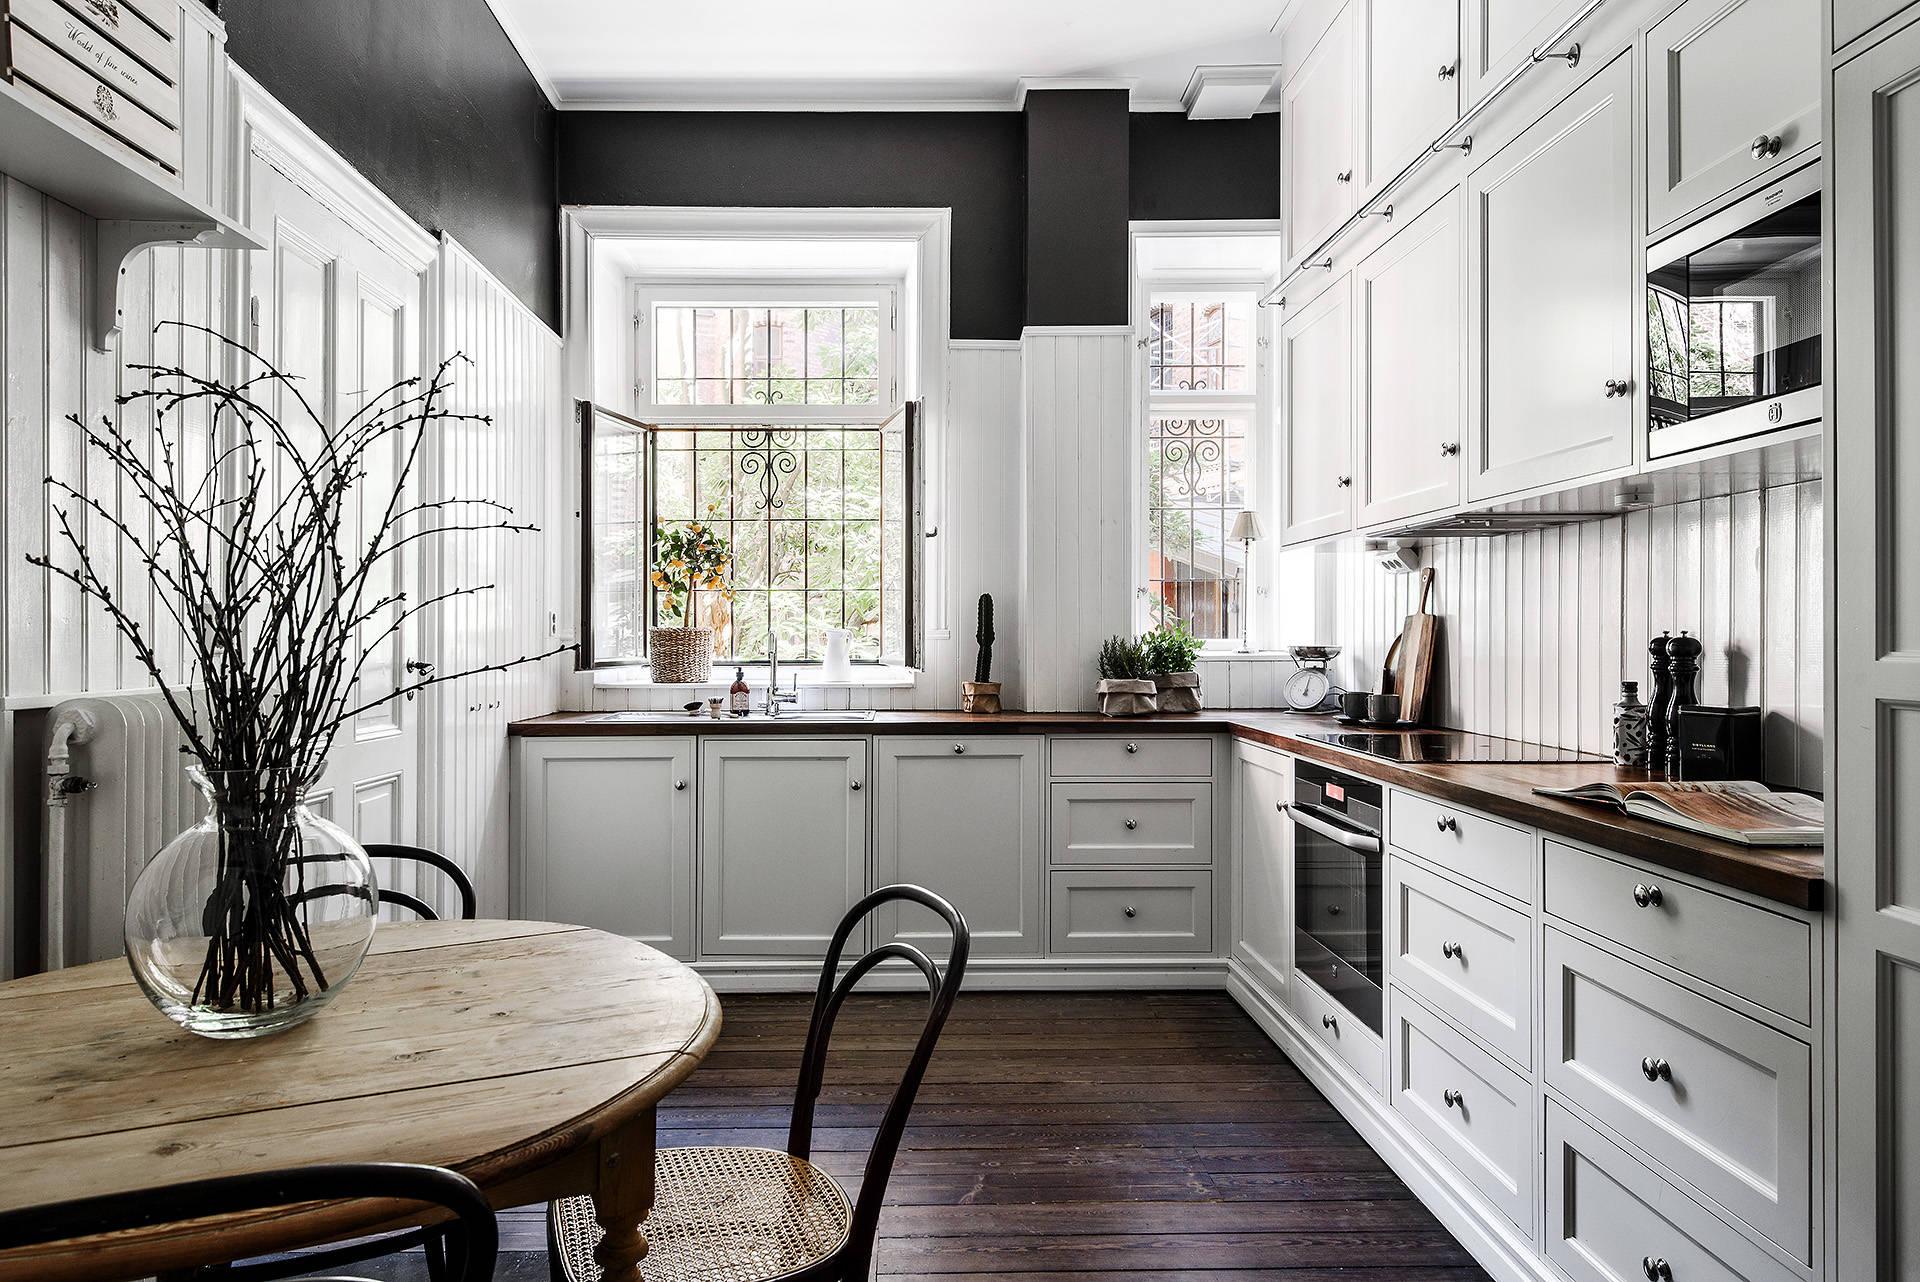 кухня белые фасады деревянный пол окна круглый стол